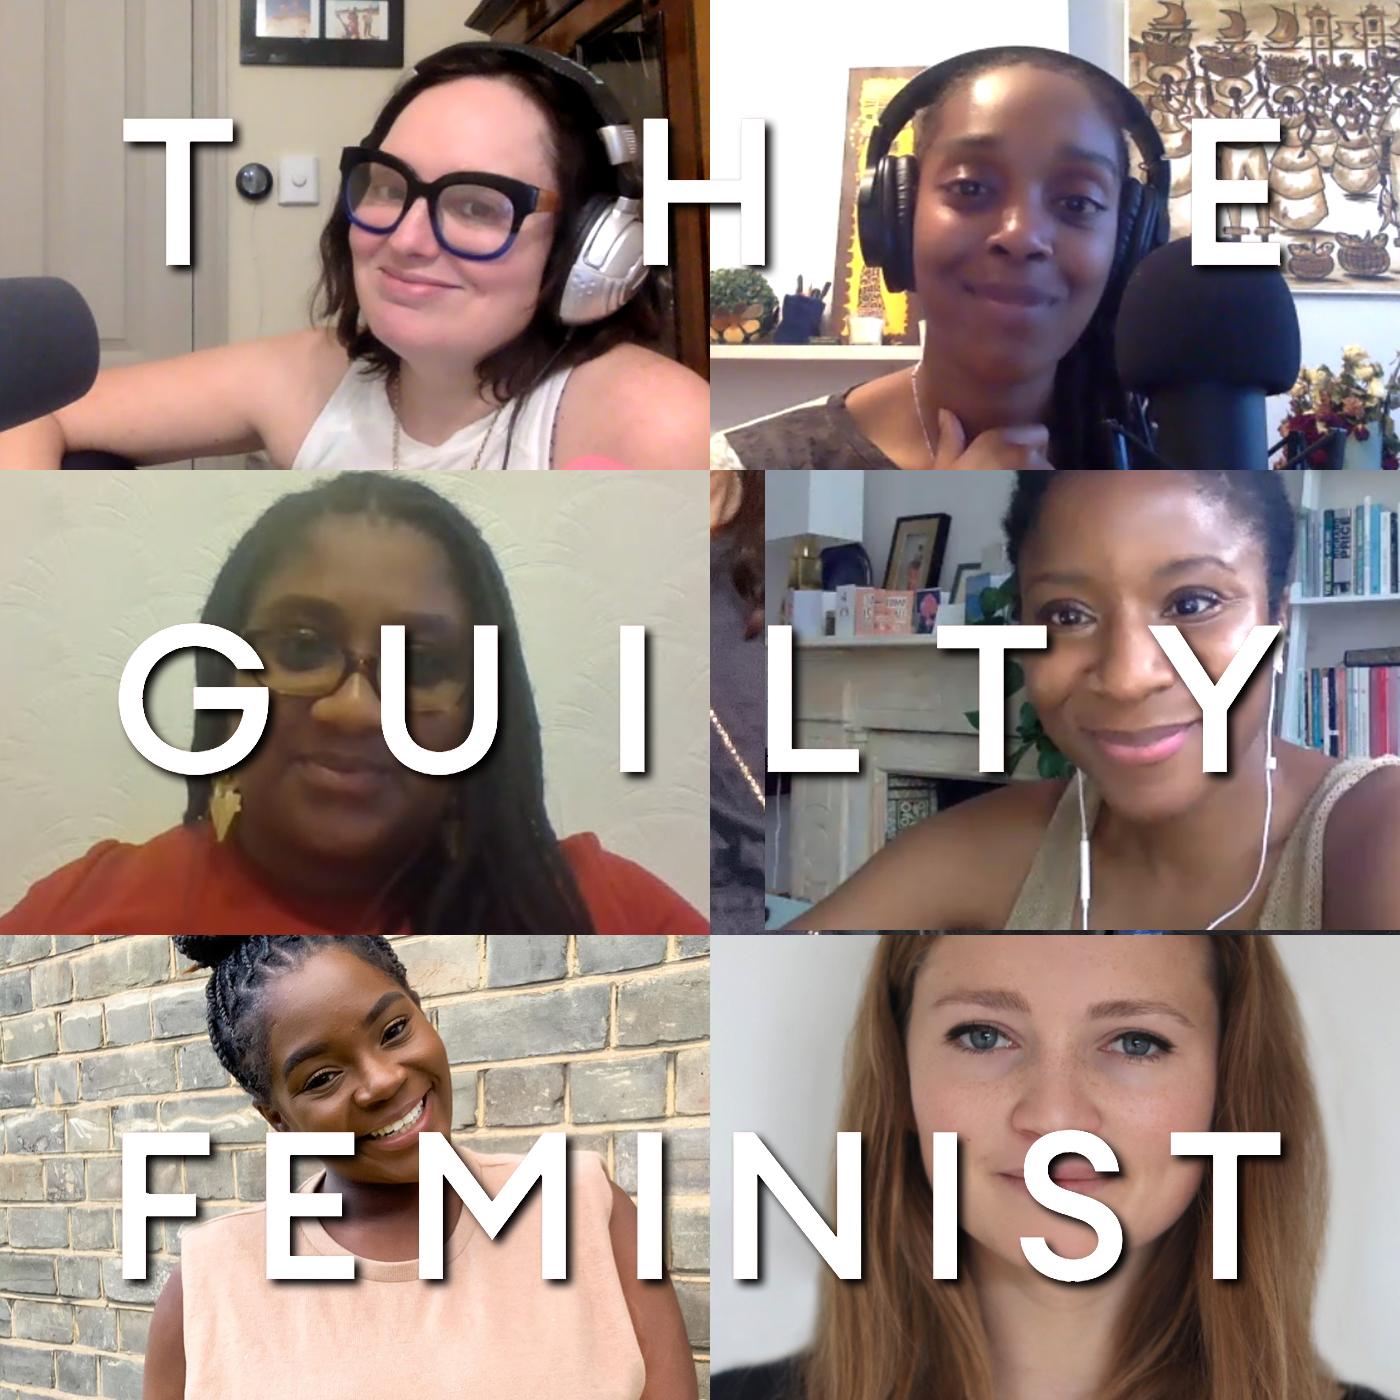 259. Hidden Inequalities with Deborah Frances-White, Athena Kugblenu, Bell Rebeiro-Addy, Dr Christine Ekechi, Mathilda Mallinson and Tinuke Awe